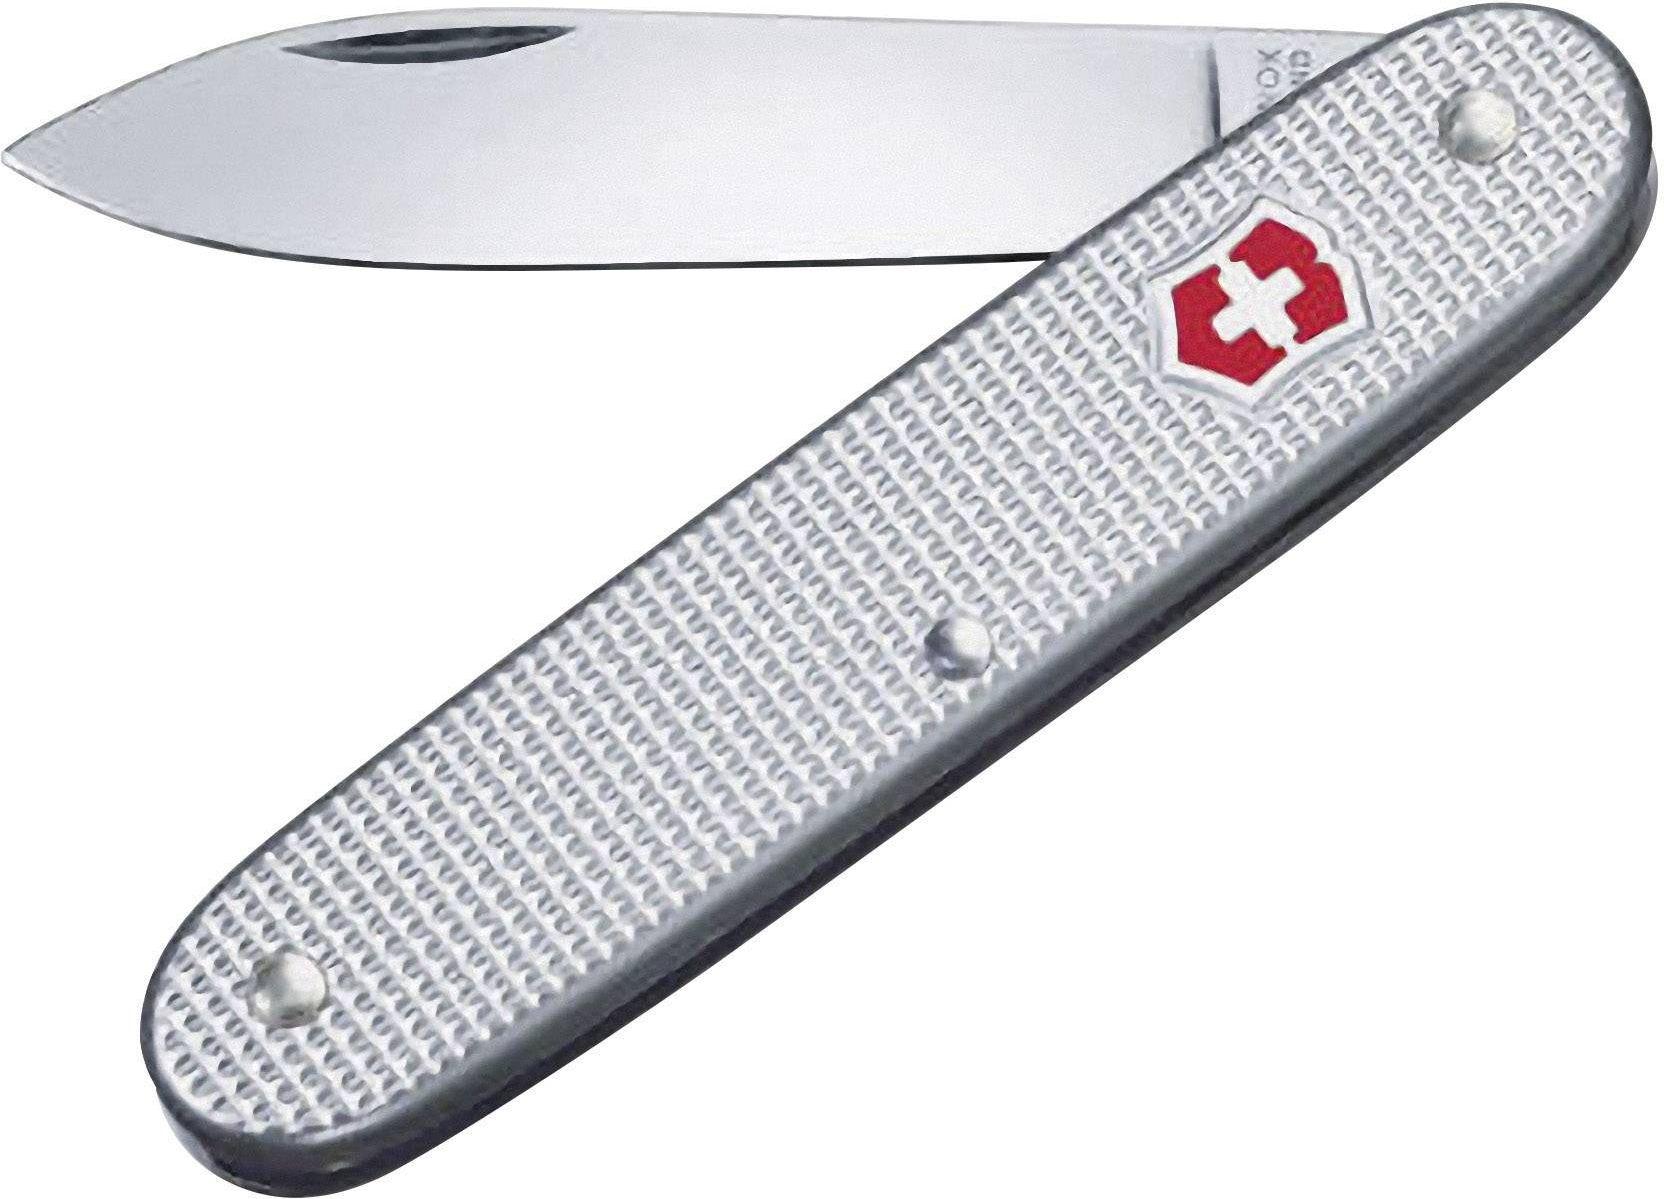 Victorinox Scyzoryk srebrny, aluminium chropowate, 93mm 0.8000.26 dārza nazis